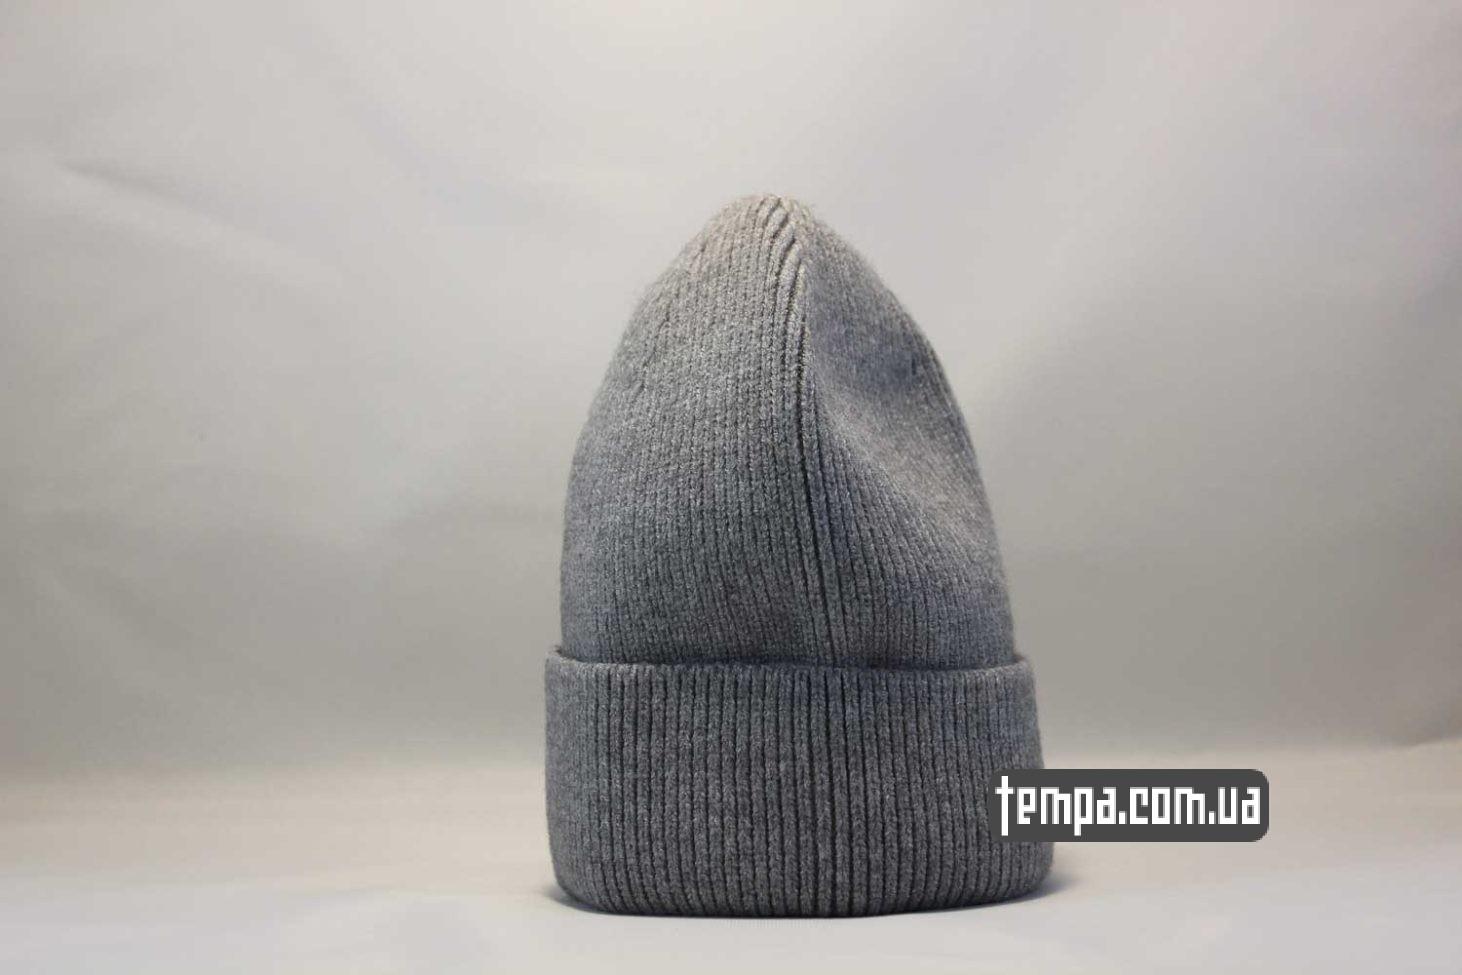 champion ukraine store шапка beanie champion серая Украина купить